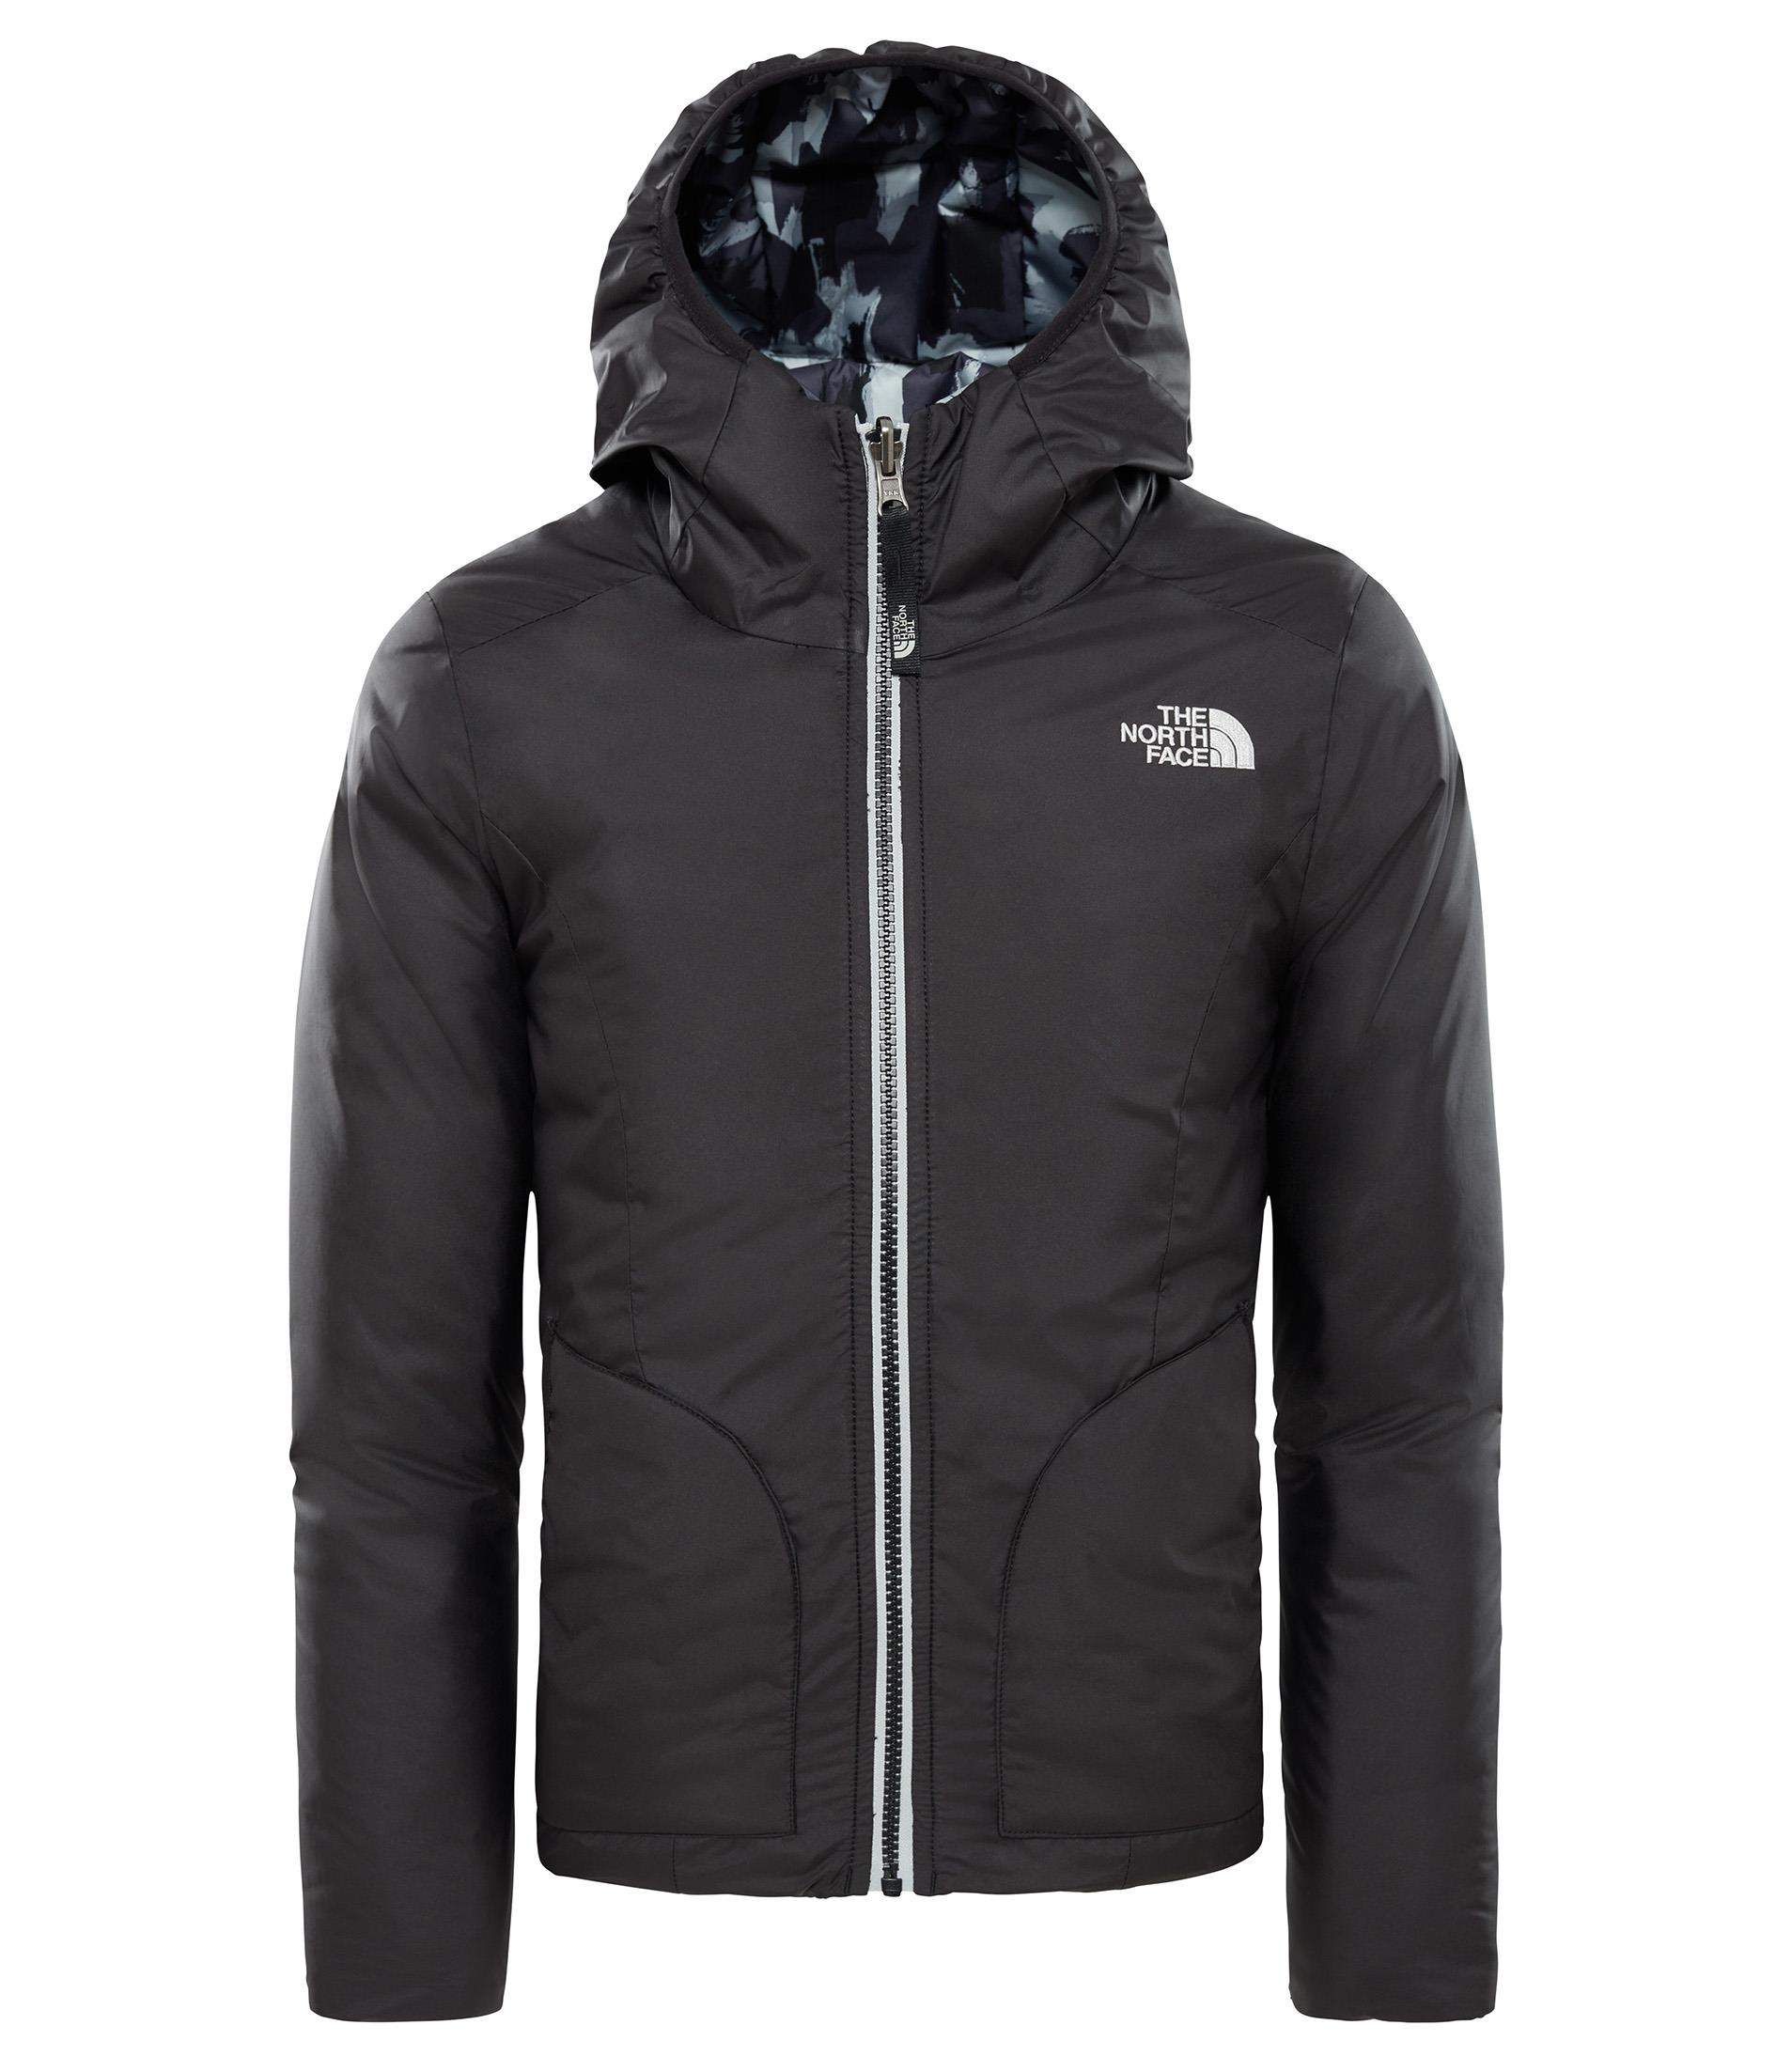 The North Face Çift Taraflı Giyilen Perrito Çocuk Ceket T93CVQJK3